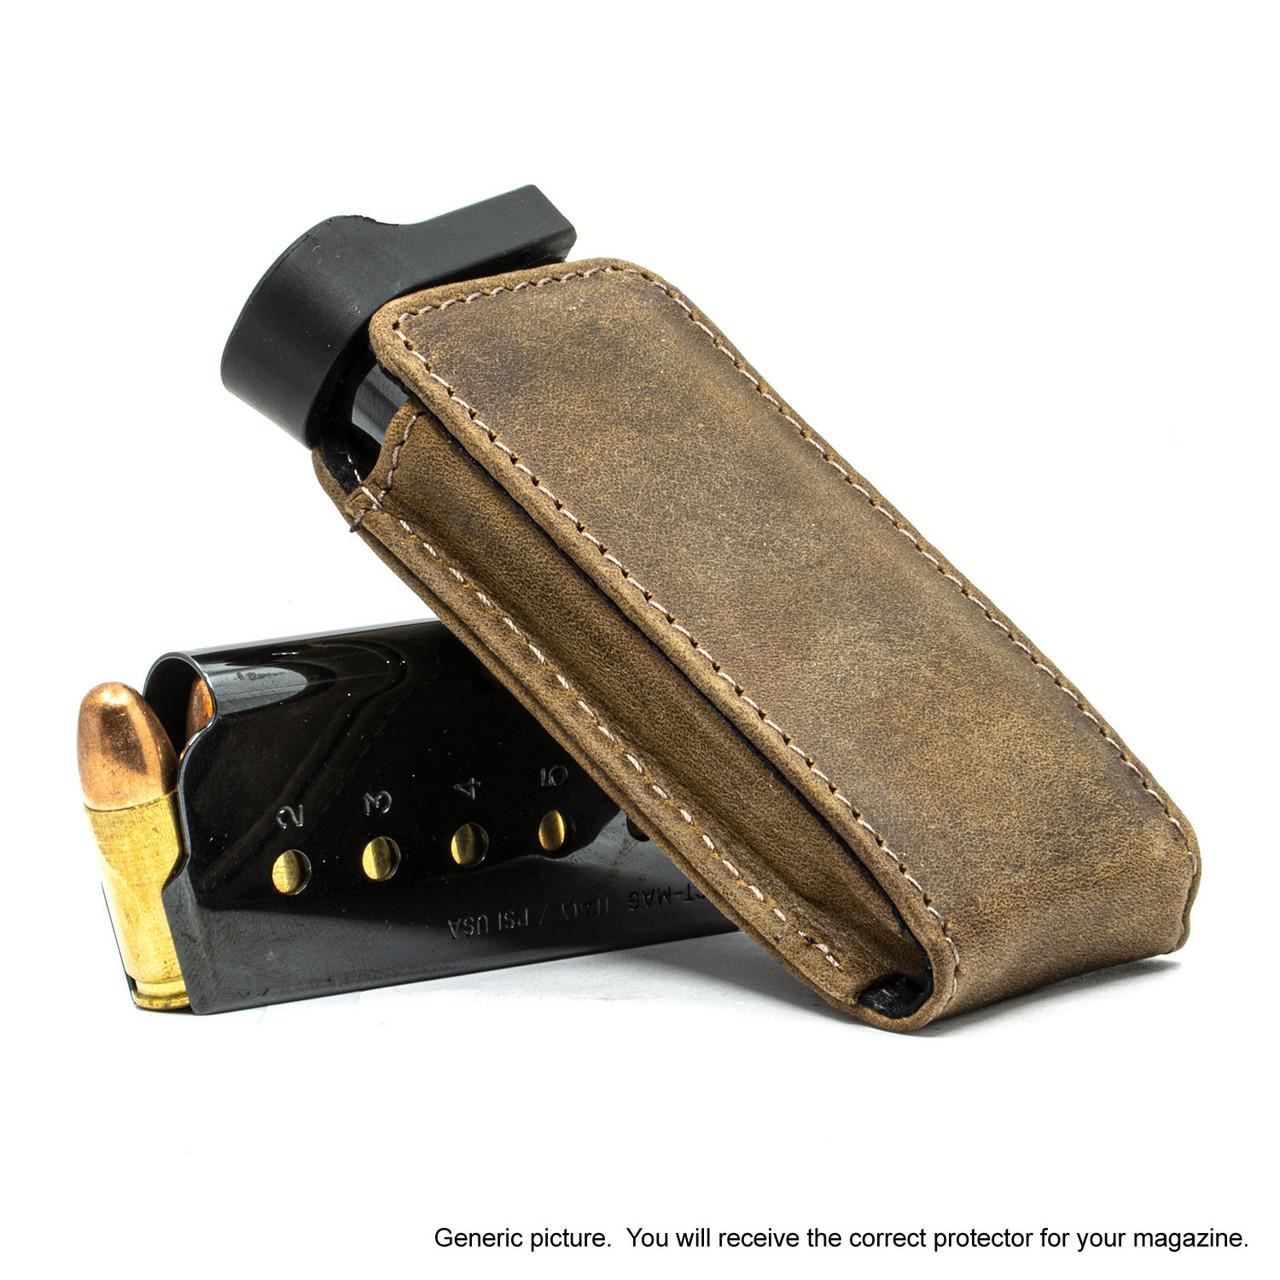 Taurus Millennium Pro 140 Brown Freedom Magazine Pocket Protector